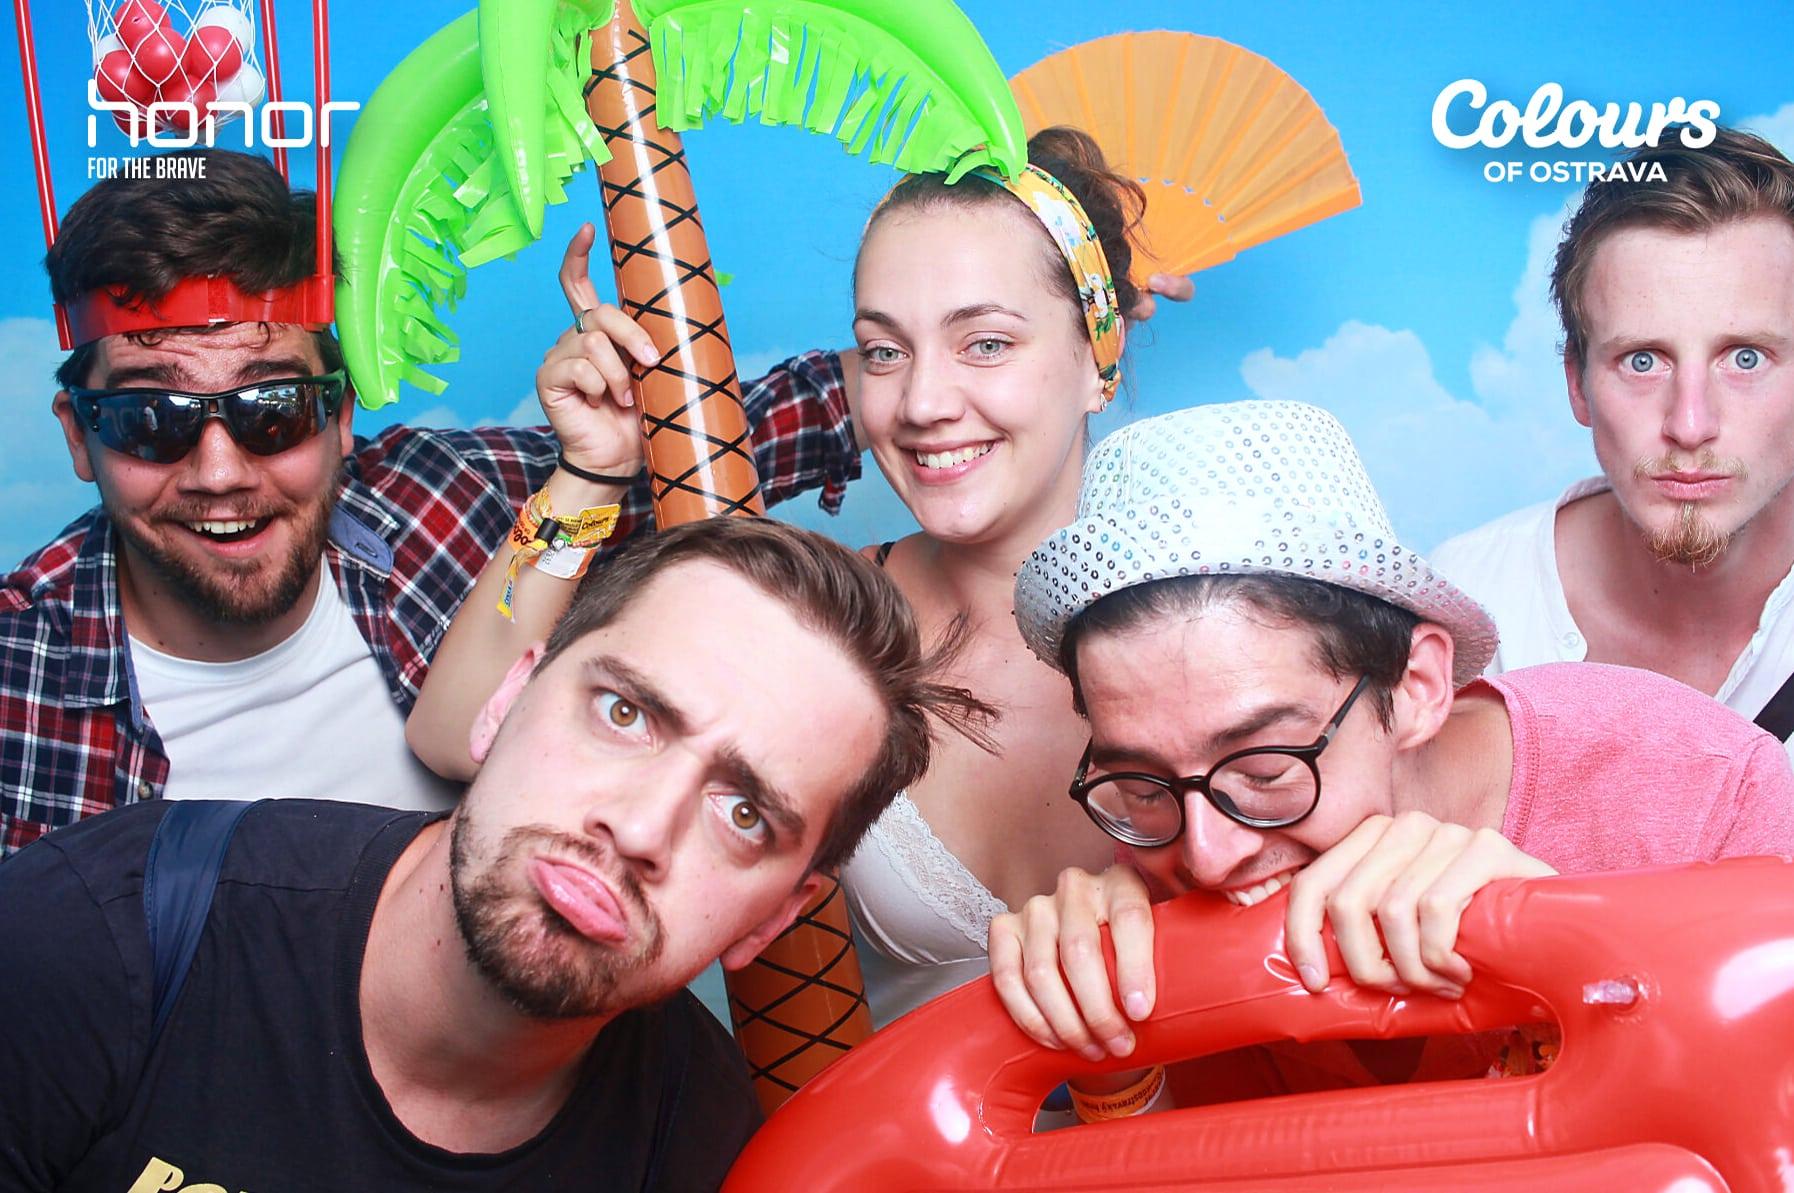 fotokoutek-festival-ostrava-honor-colours-of-ostrava-21-7-2018-463412